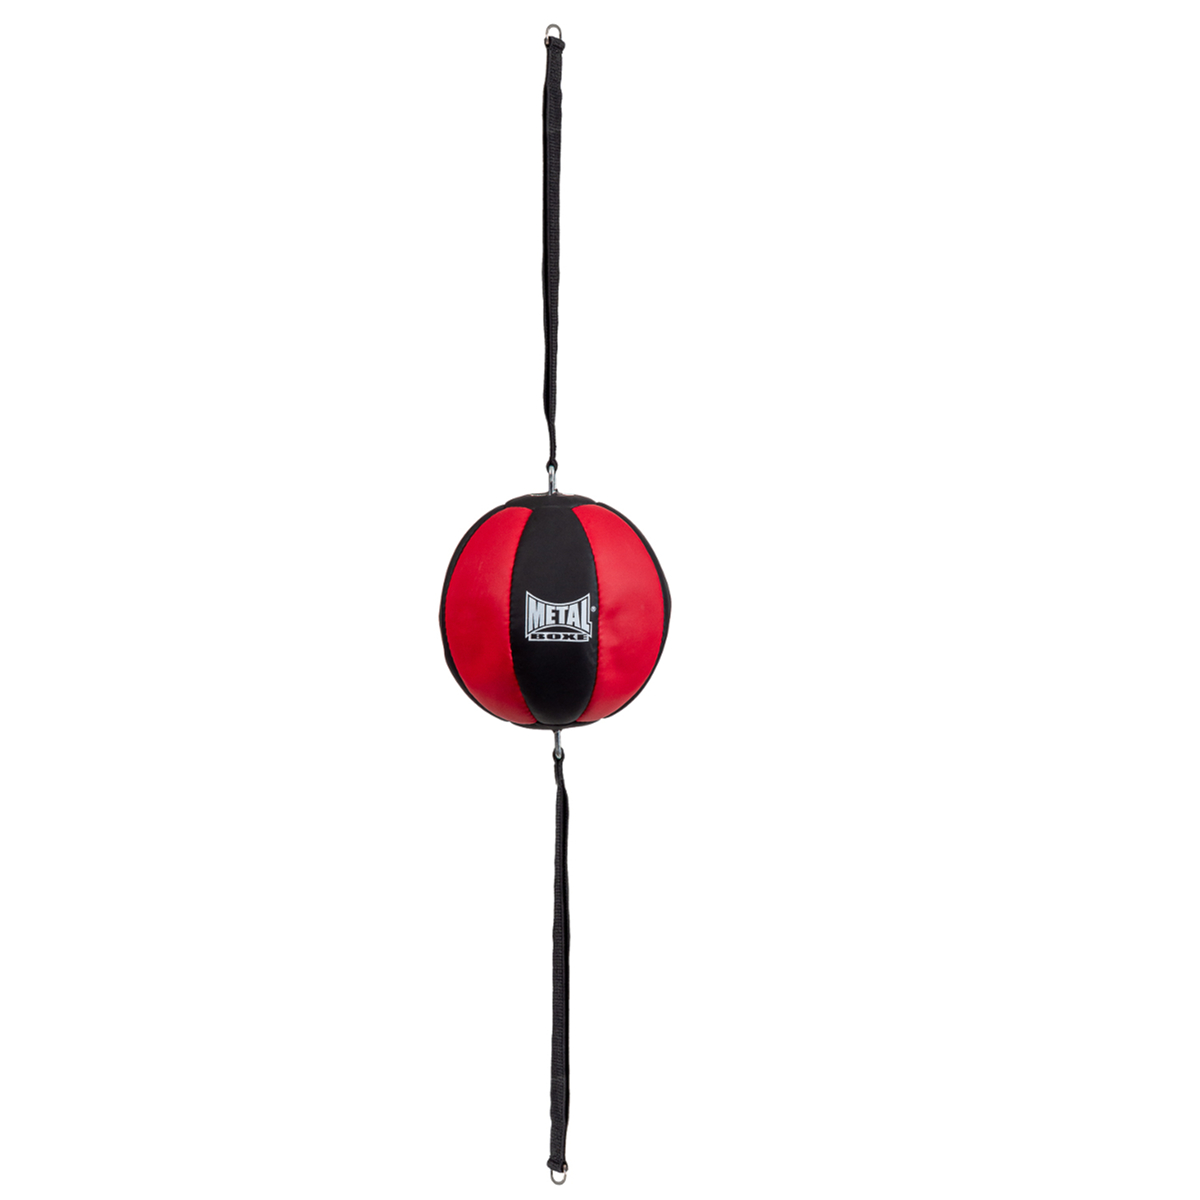 Mini ballon double élastique Métal boxe